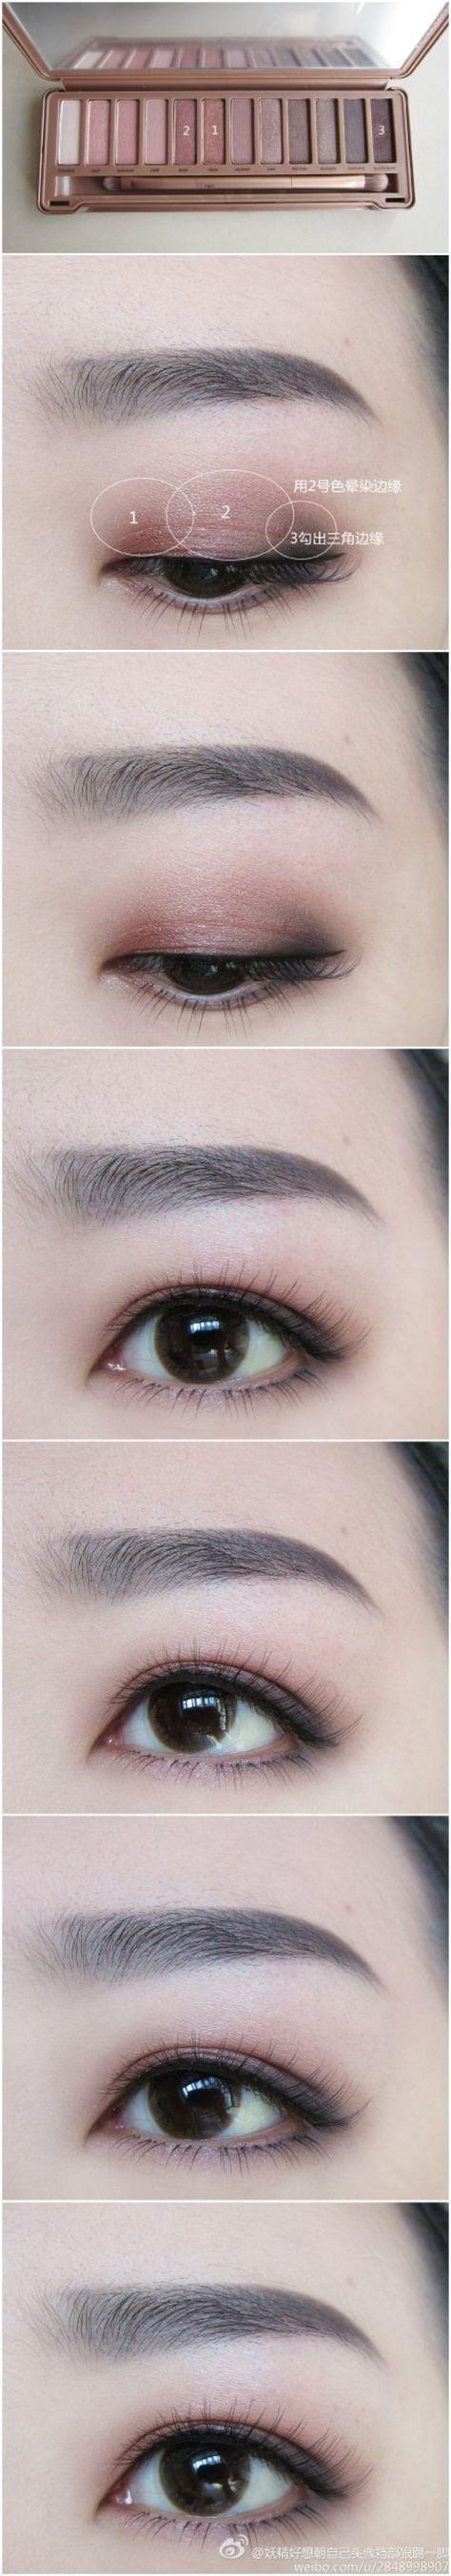 Asian makeup using color eye contact lenses #circlelens. SHOP from www.eyecandys...